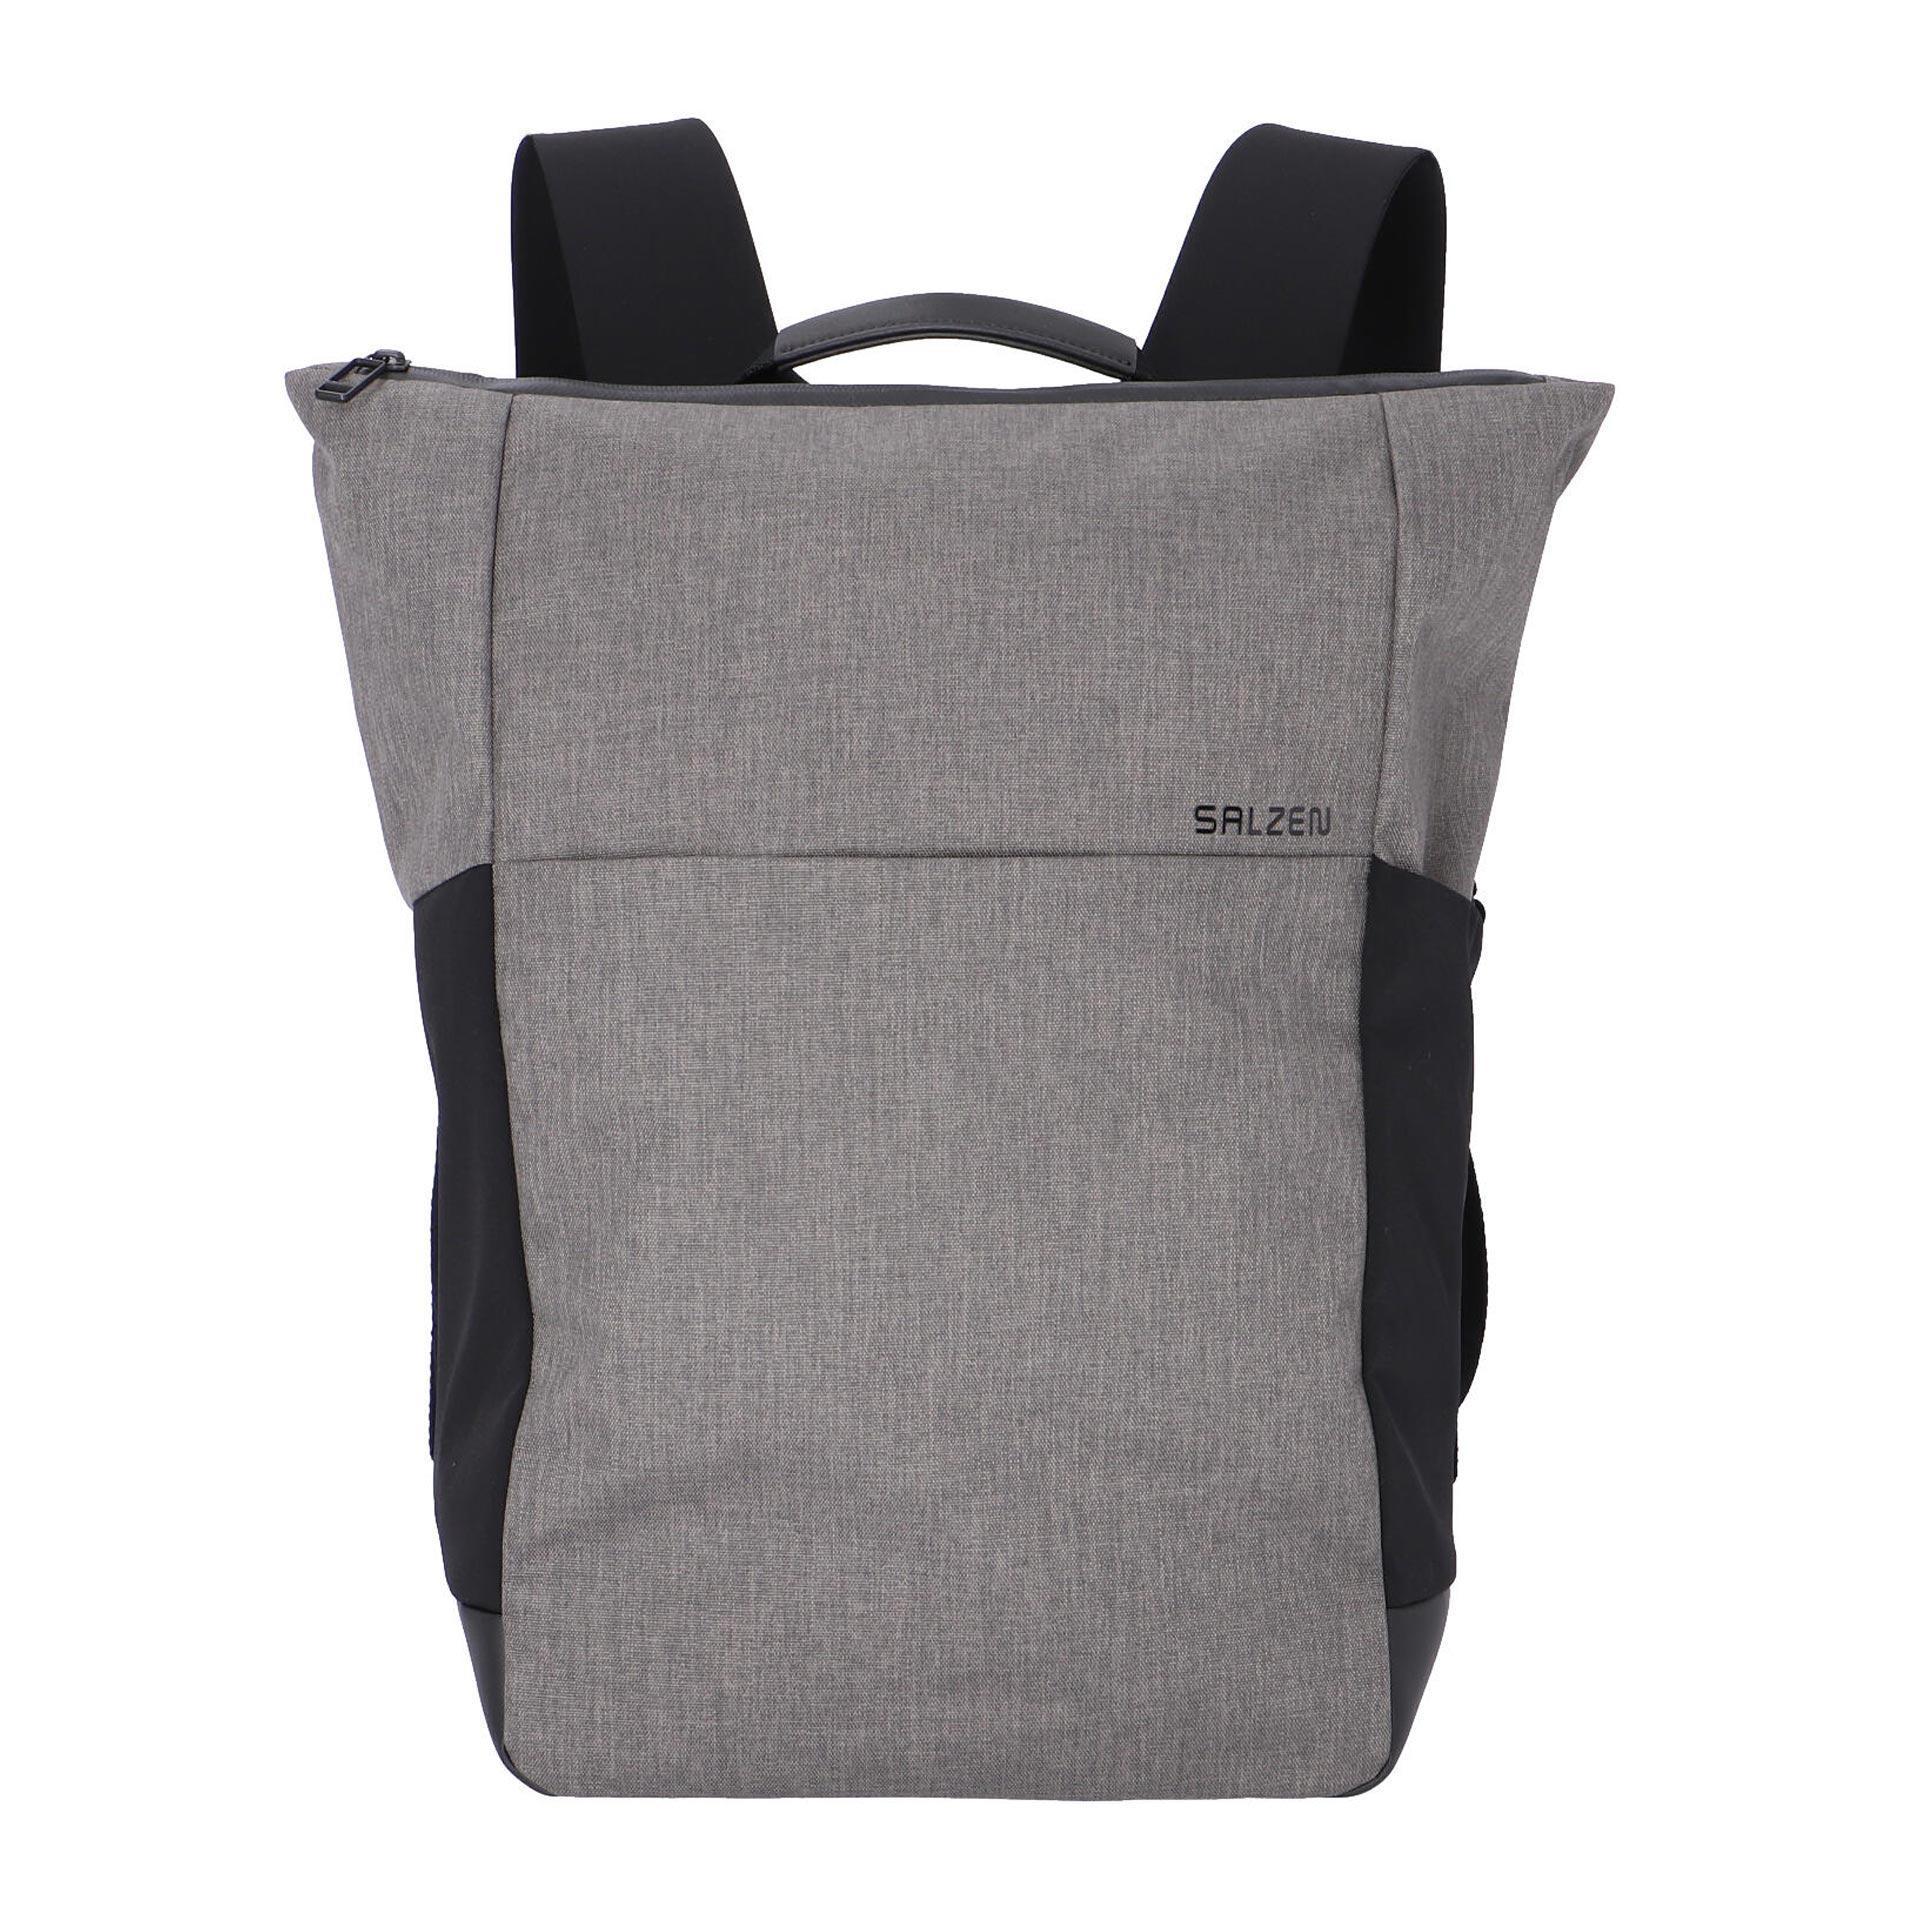 Salzen Vertiplorer Fabric Plain Backpack storm grey